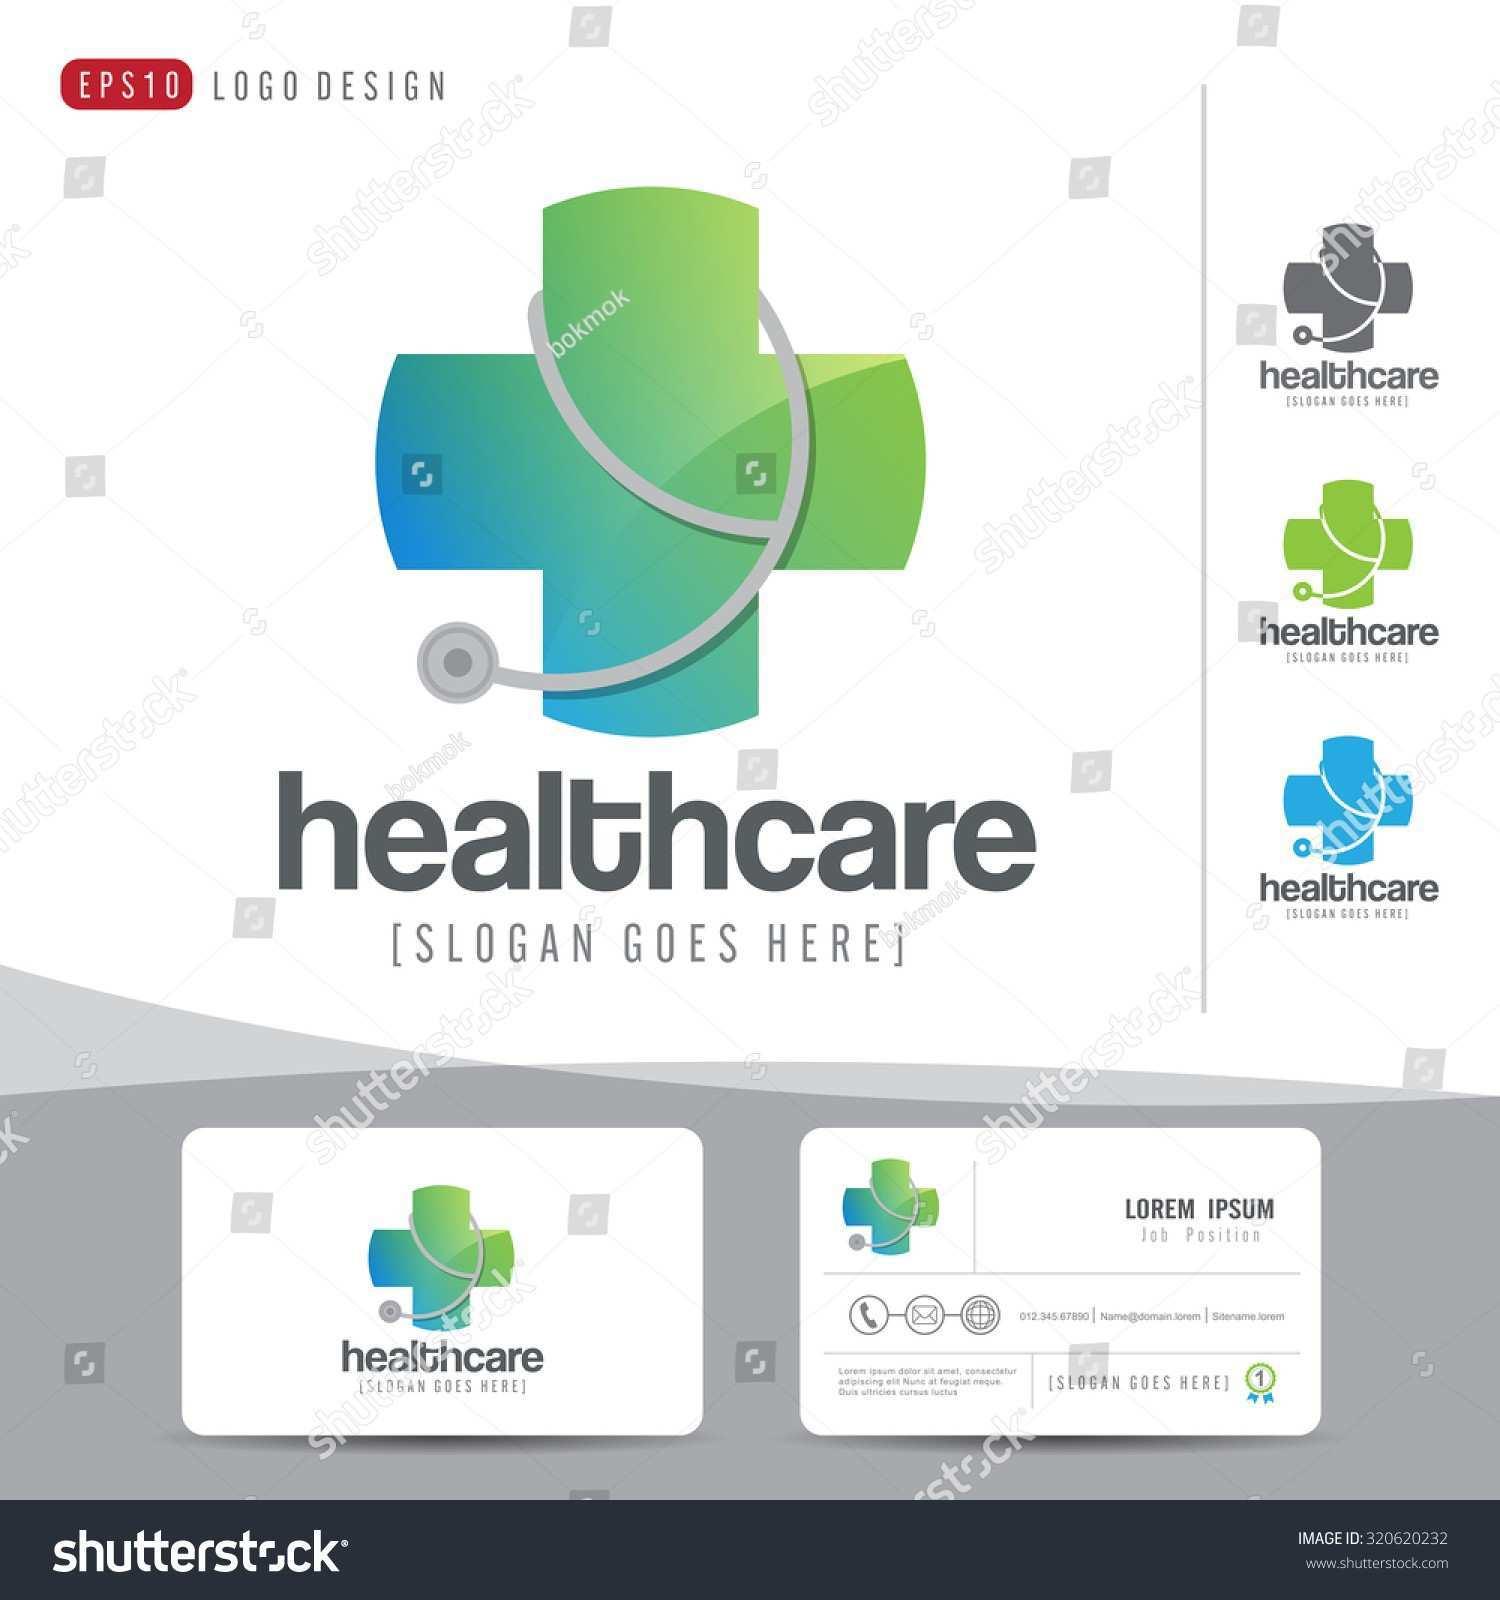 74 Best Blank Business Card Template Word 2007 PSD File for Blank Business Card Template Word 2007